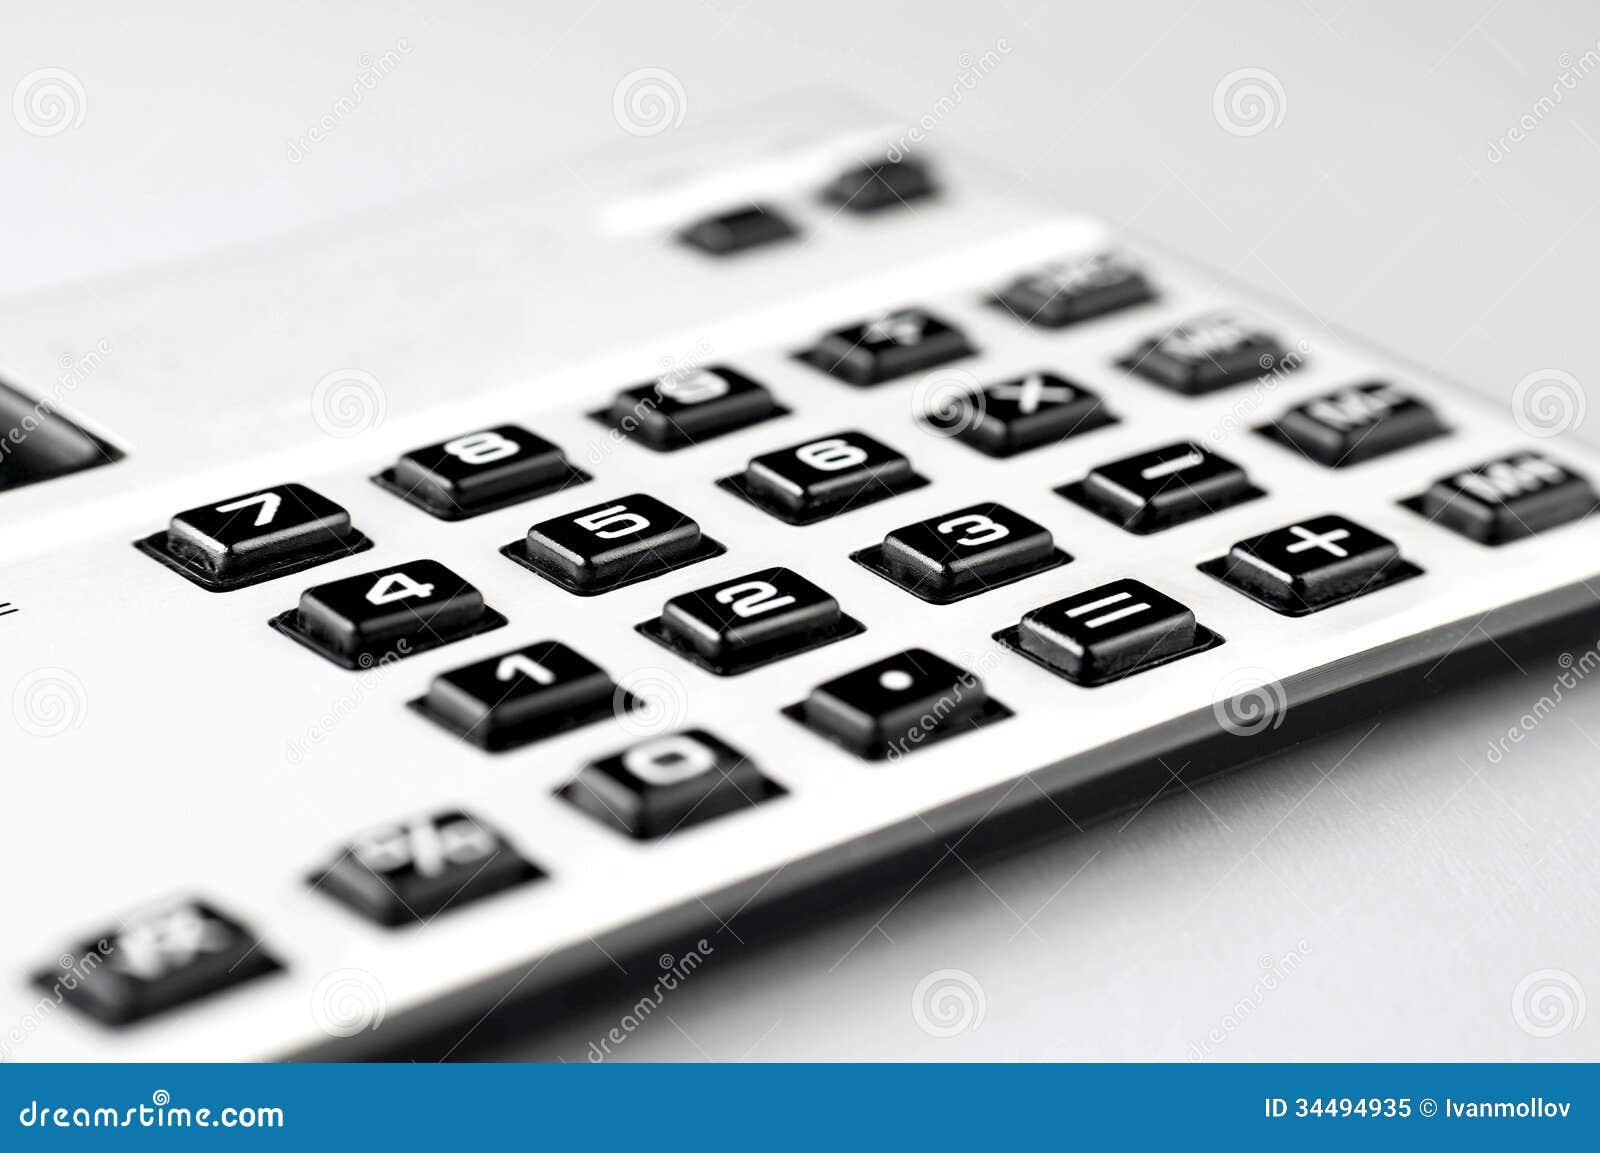 Blocktix coin calculator keyboard - Cat dog veterinaria